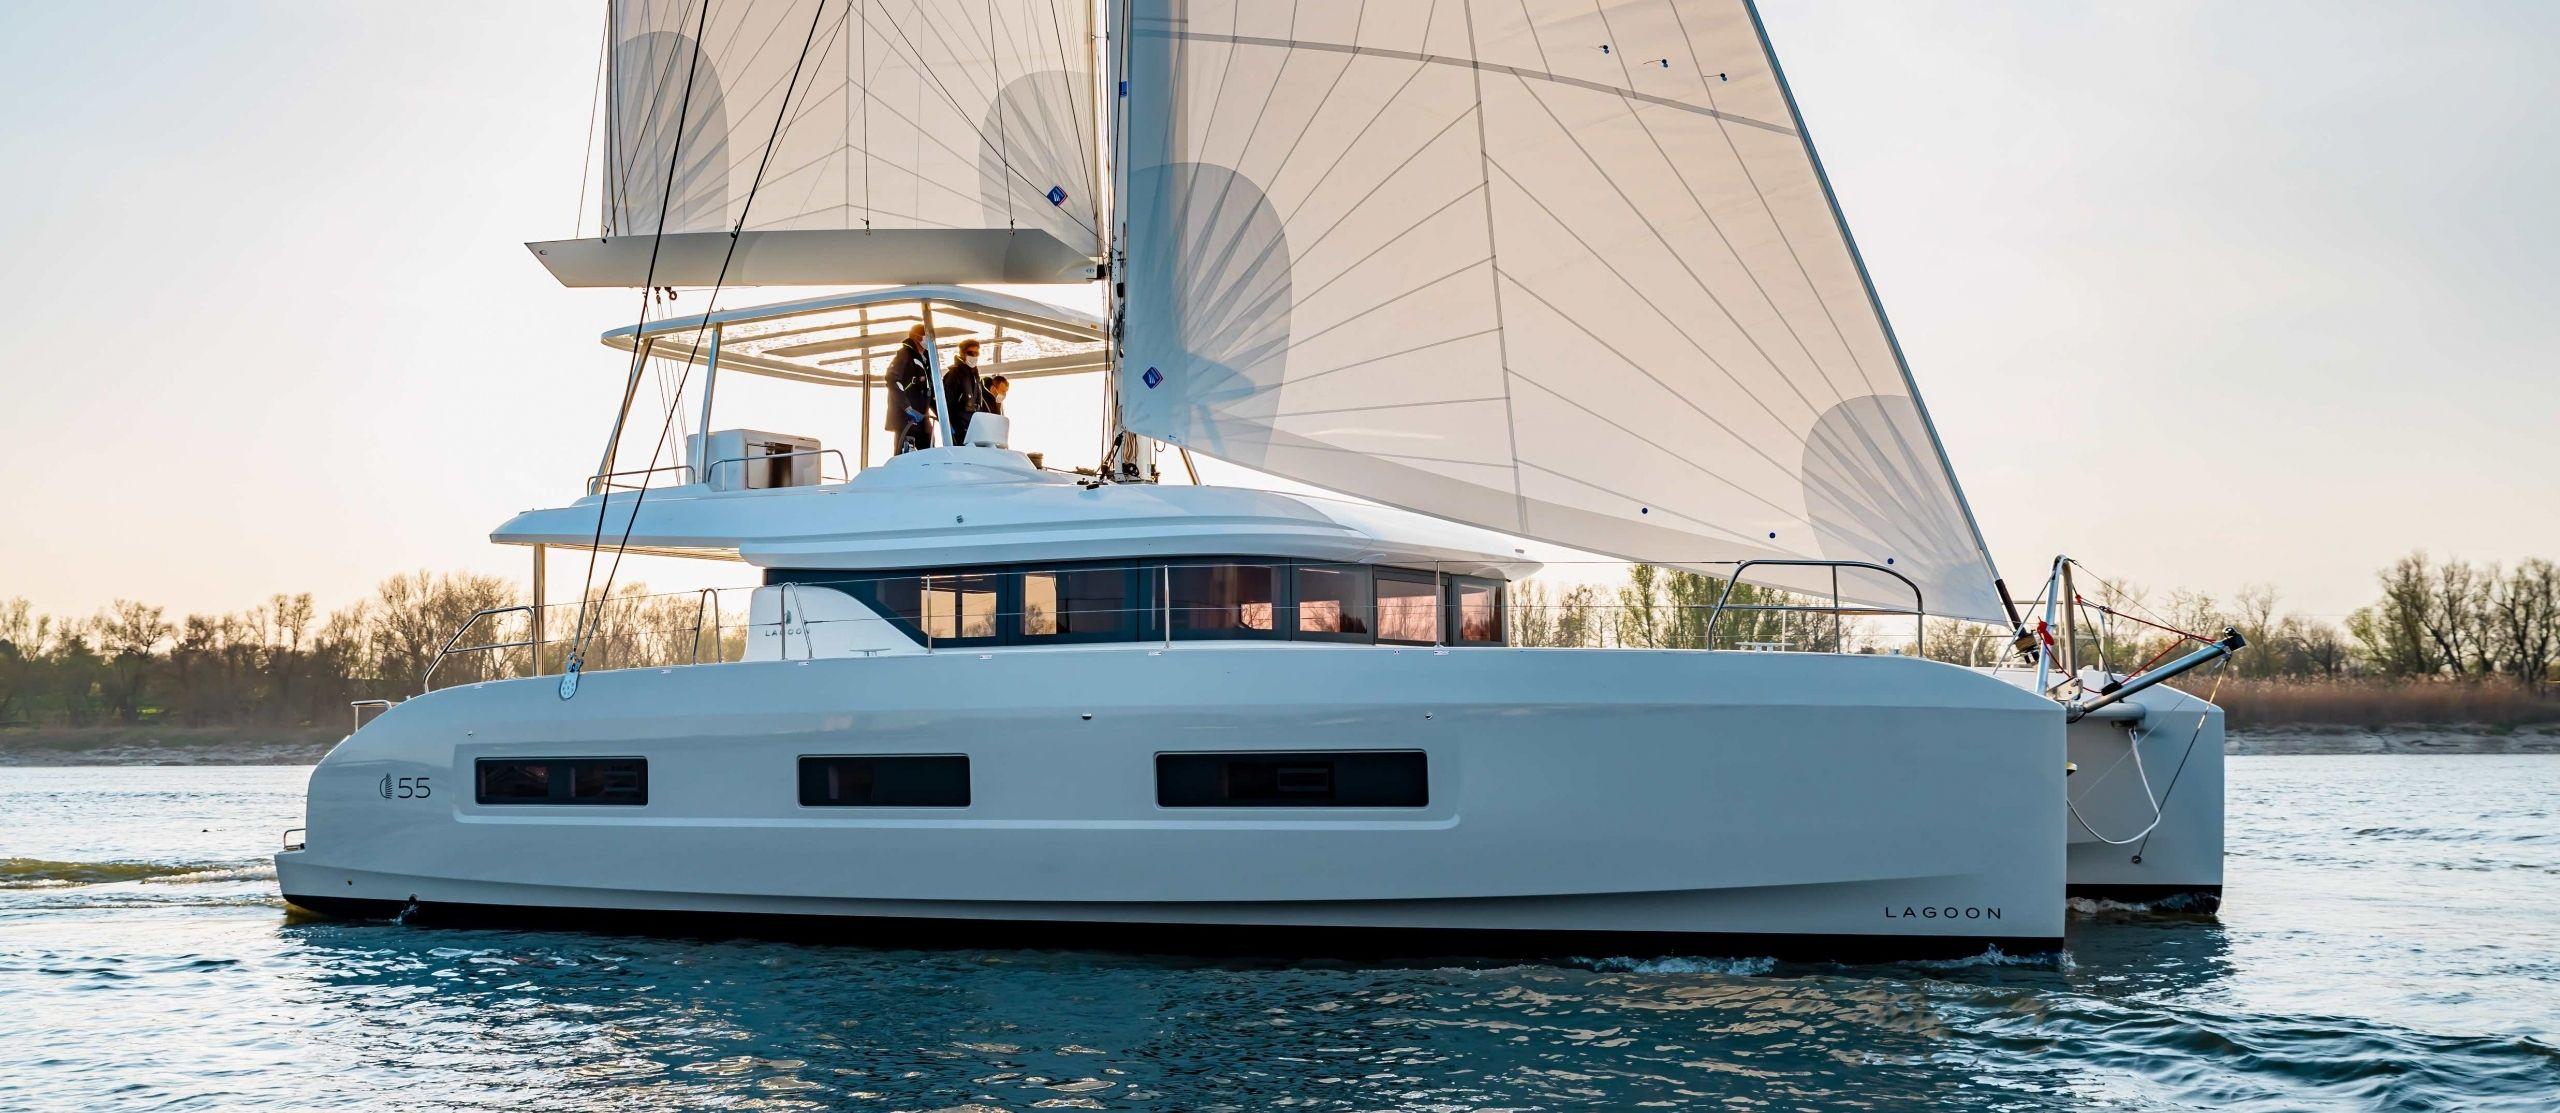 Catatmaran Lagoon - Lagoon 55 - Boats for sale